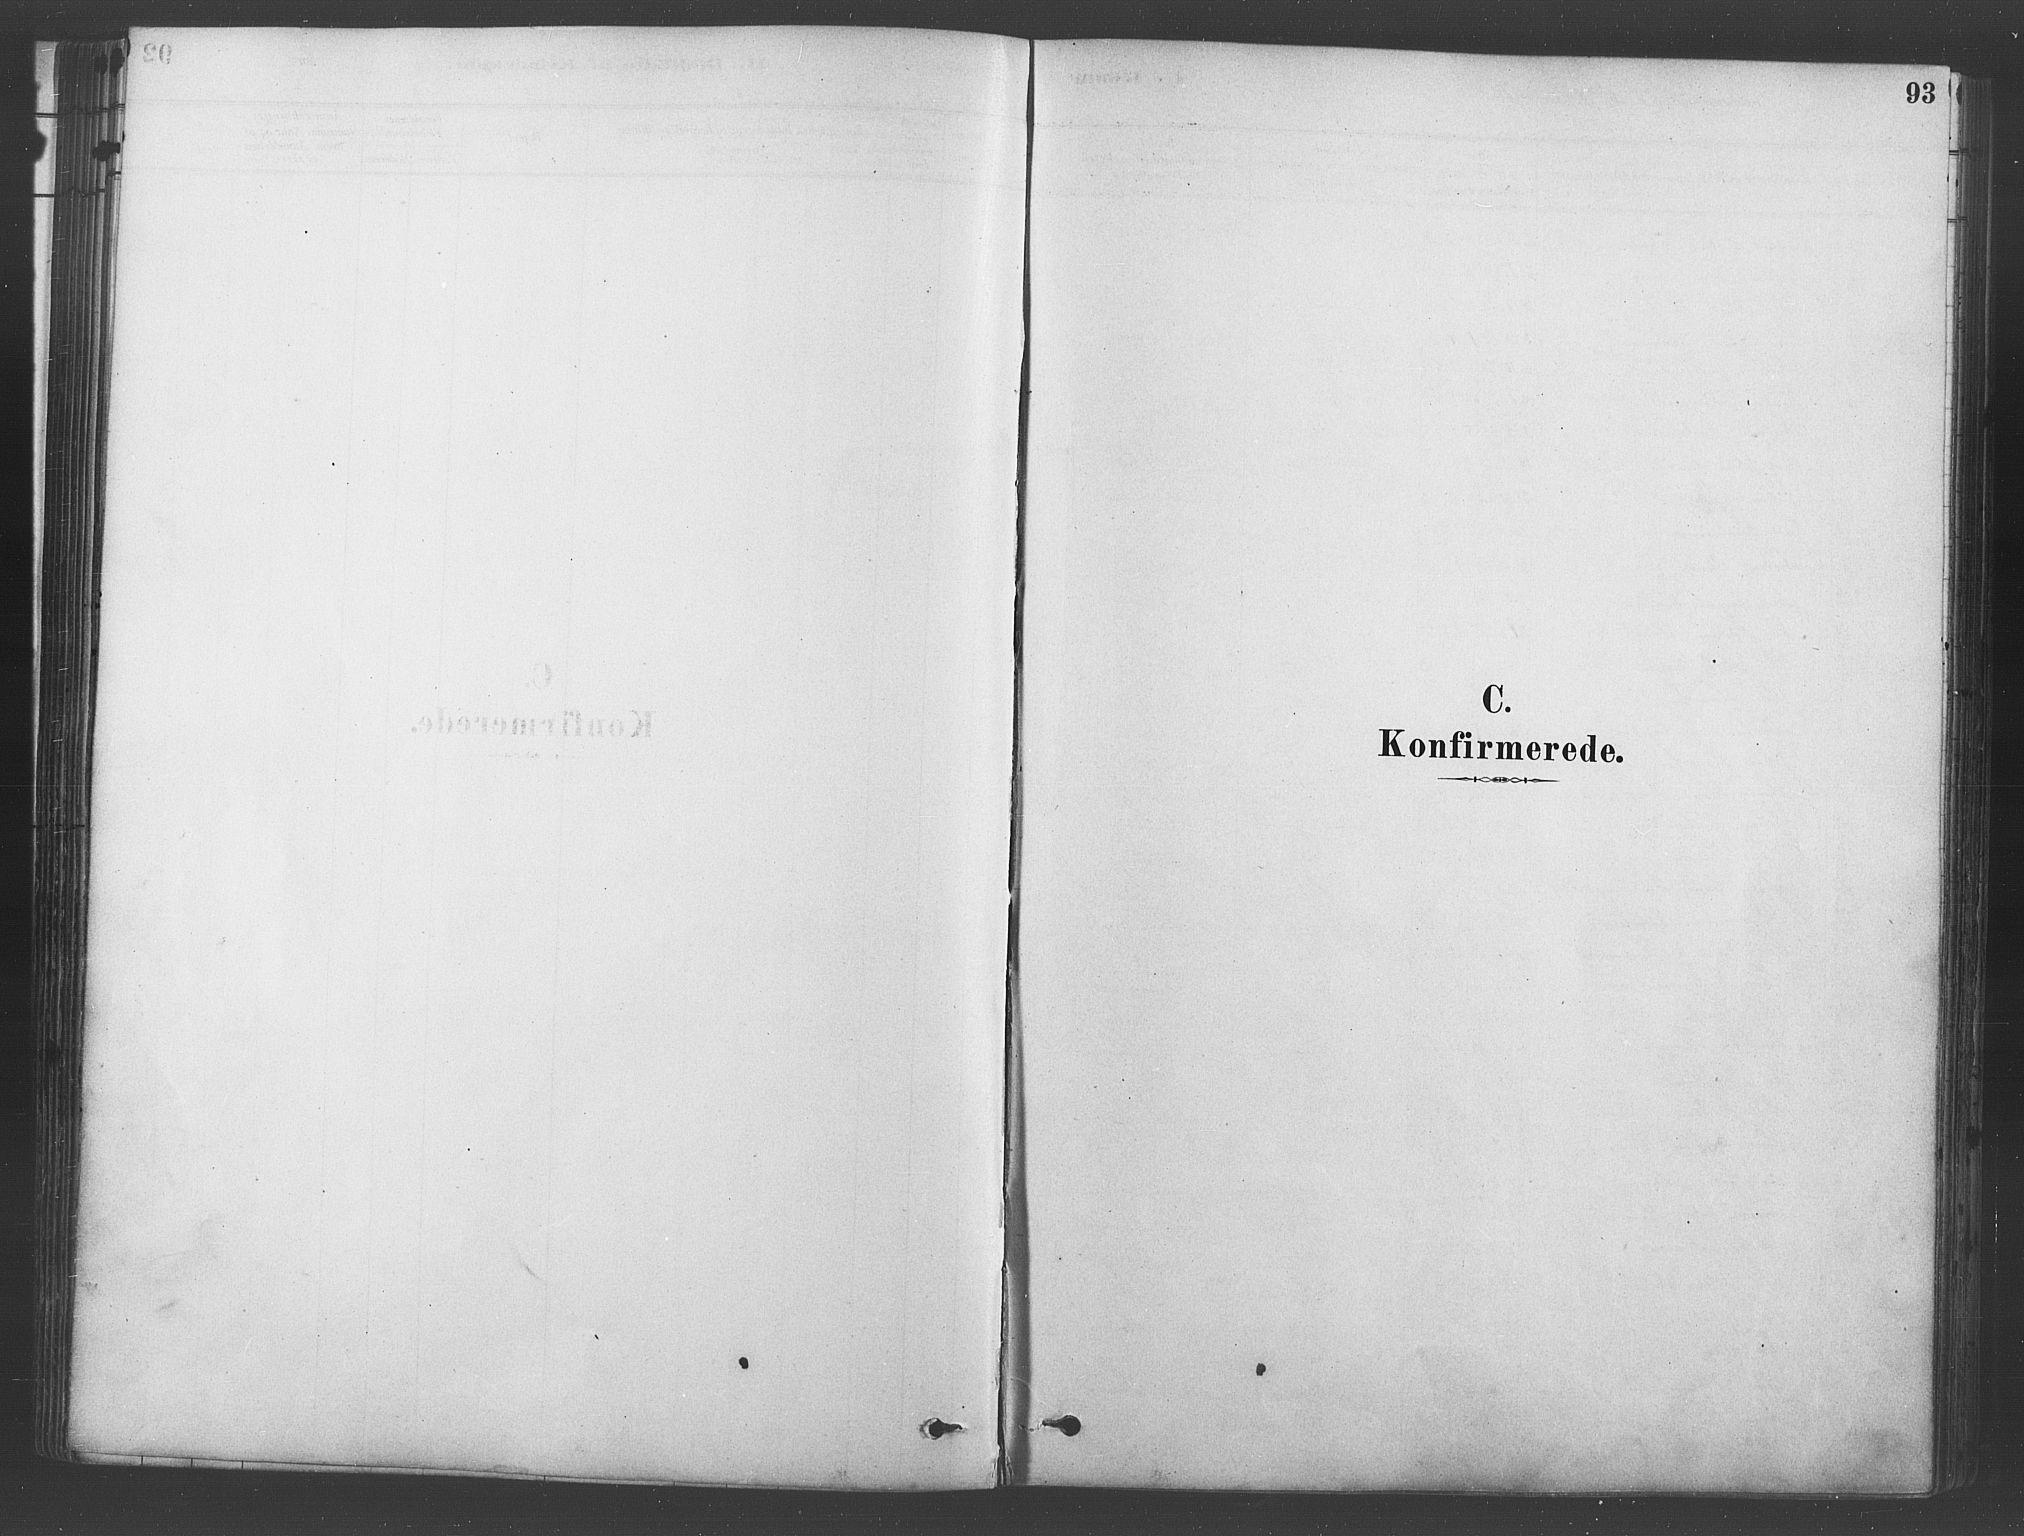 SAO, Ullensaker prestekontor Kirkebøker, F/Fb/L0001: Ministerialbok nr. II 1, 1878-1893, s. 93